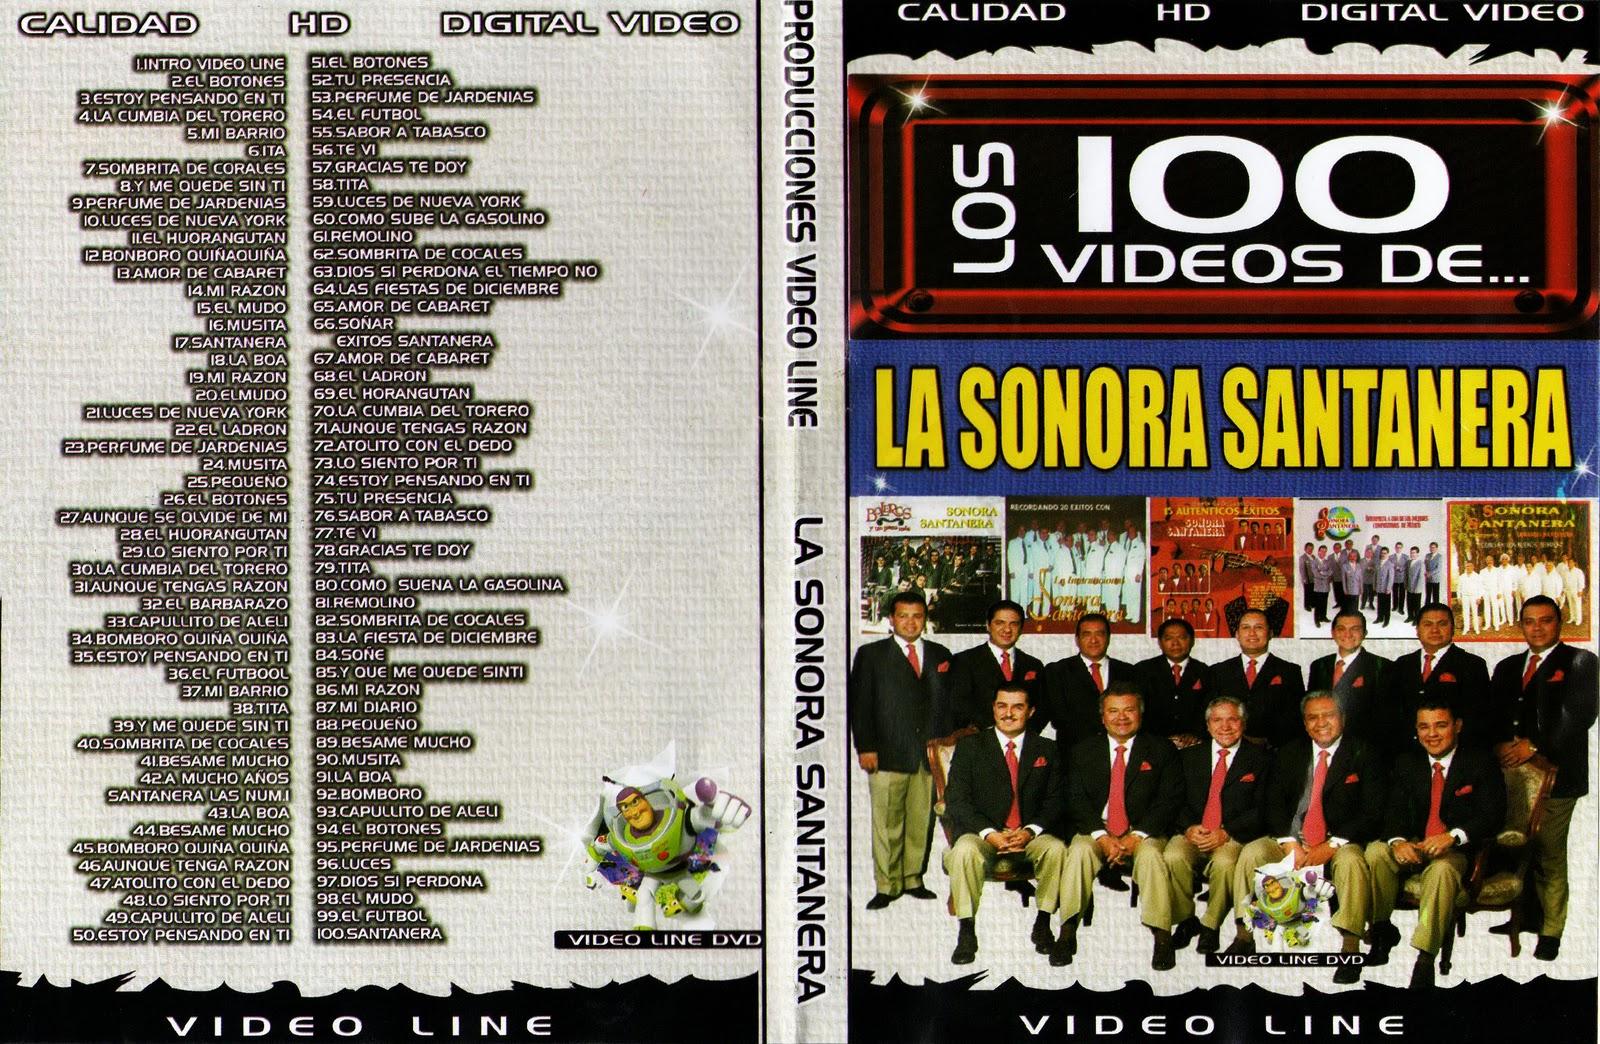 http://3.bp.blogspot.com/-9nNNCIAA788/TqeP8tiHEFI/AAAAAAAAAWk/7QfvJBOkFww/s1600/los+100+videos+de+la+sonora+santanera.jpg